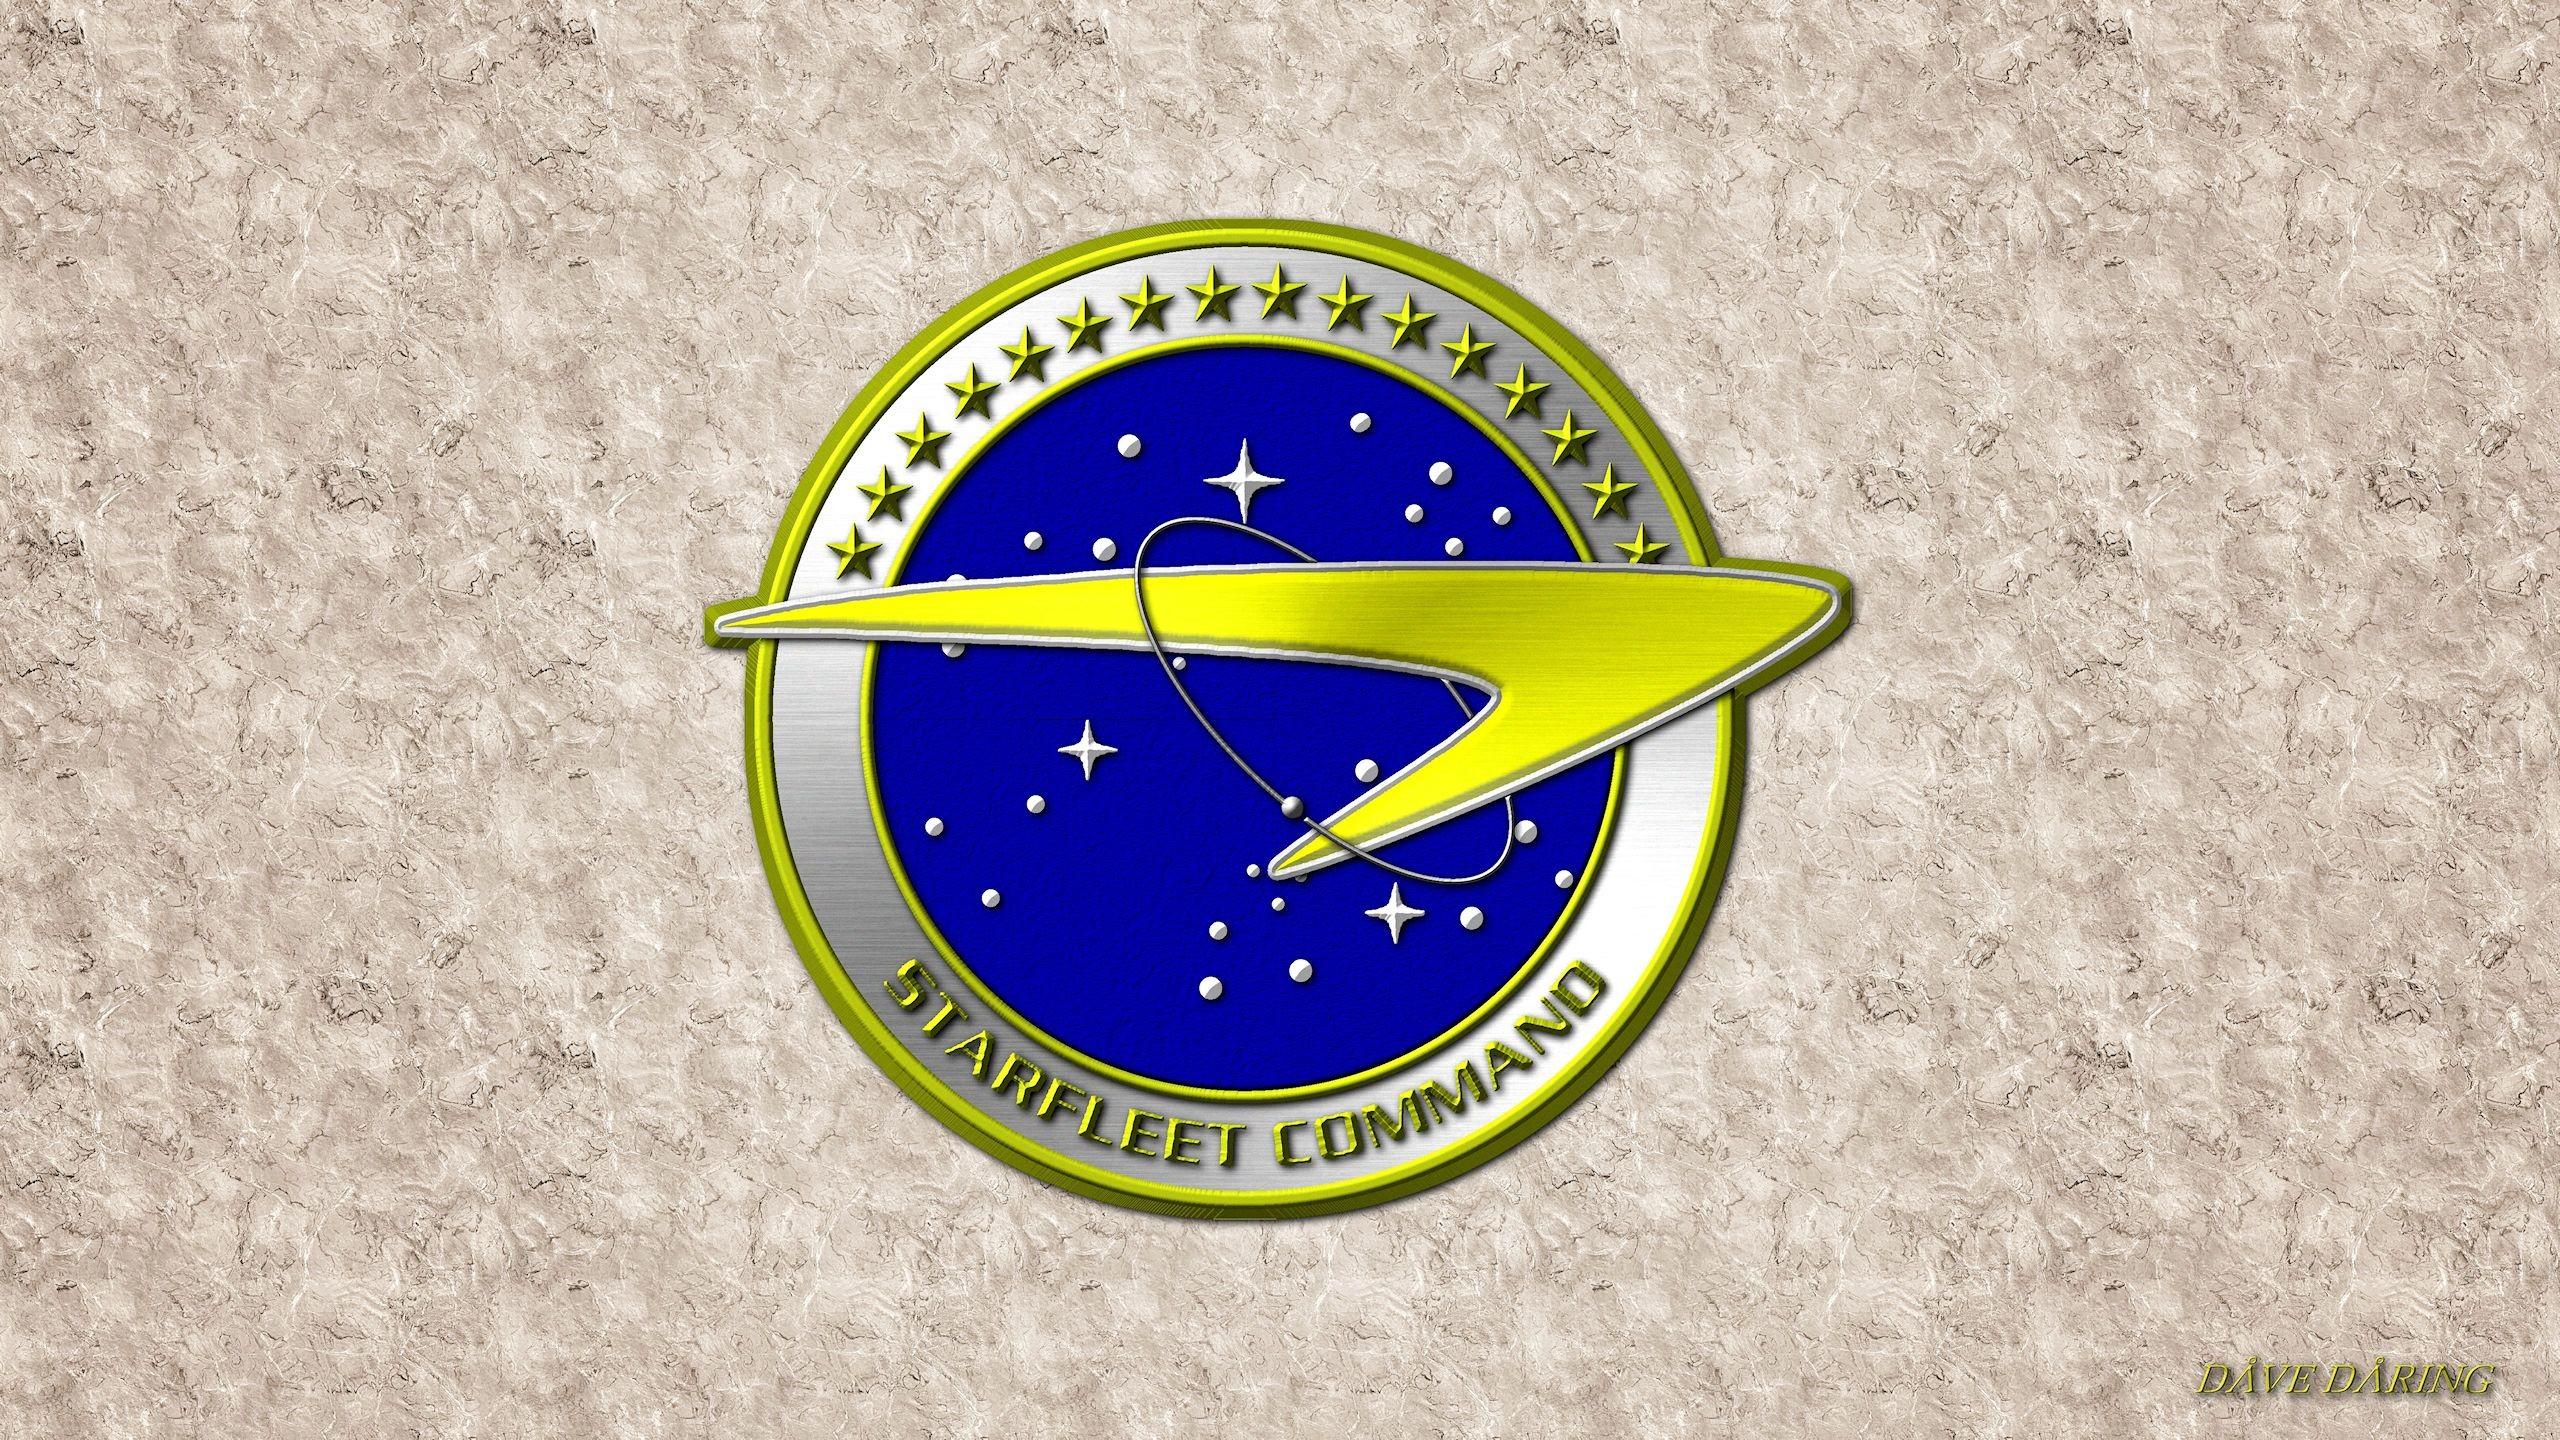 … Enterprise Era Starfleet Command Emblem by Dave-Daring